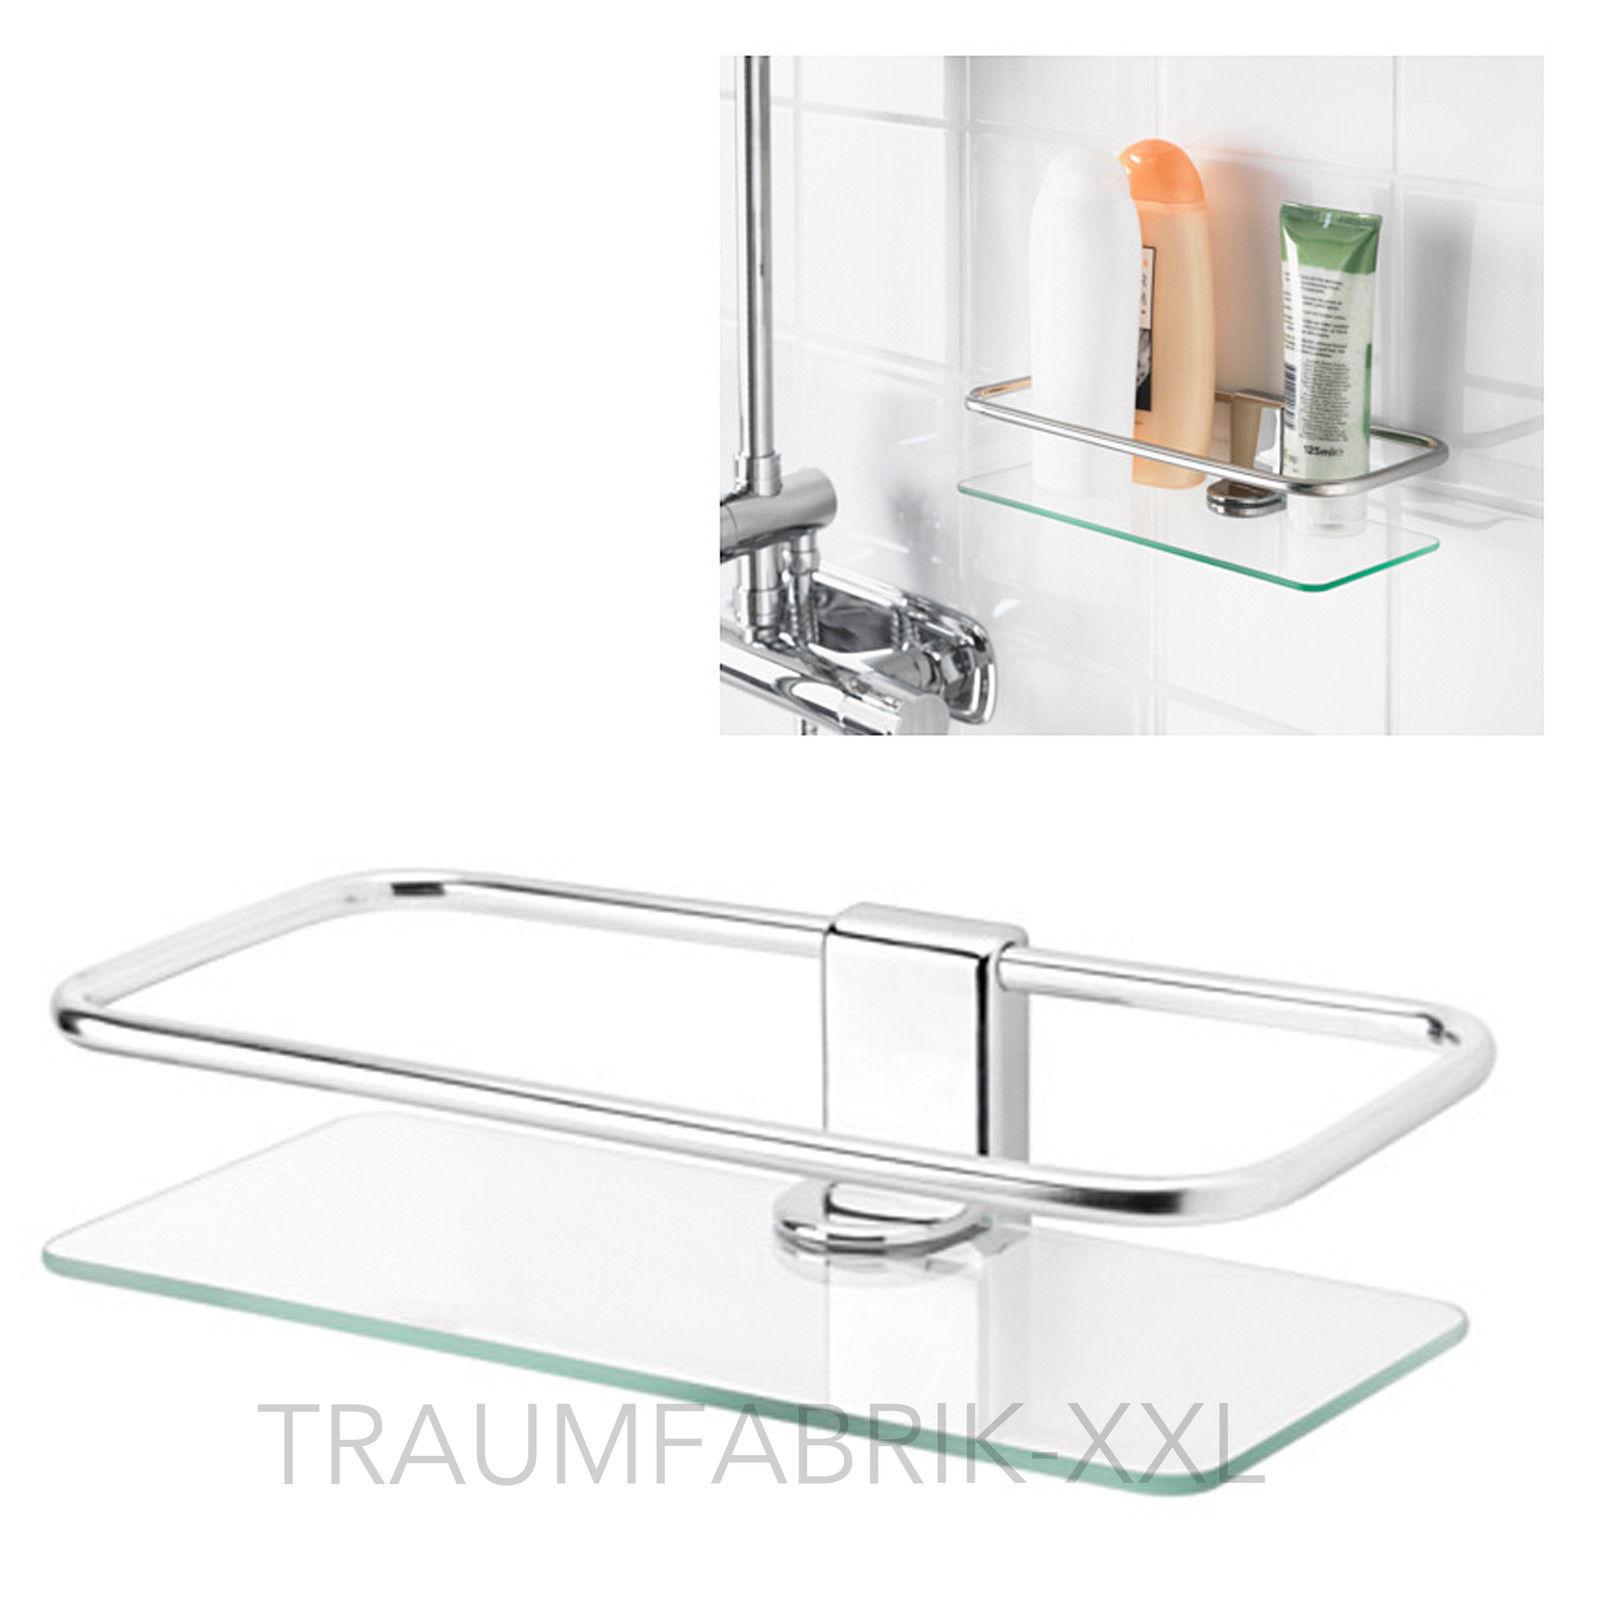 Badezimmer regale affordable badezimmer regal mbelideen - Handtuch regal selber bauen ...